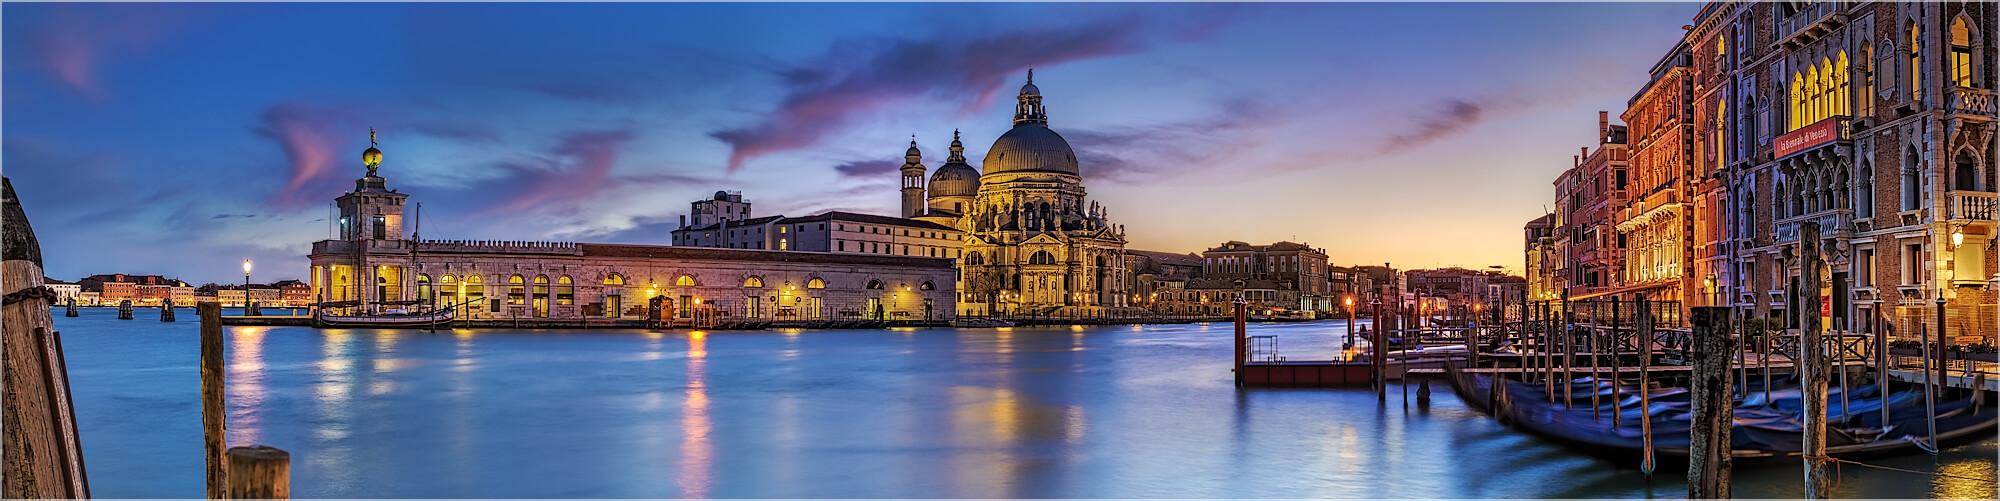 Panoramabild Santa Maria della Salute Venedig Italien